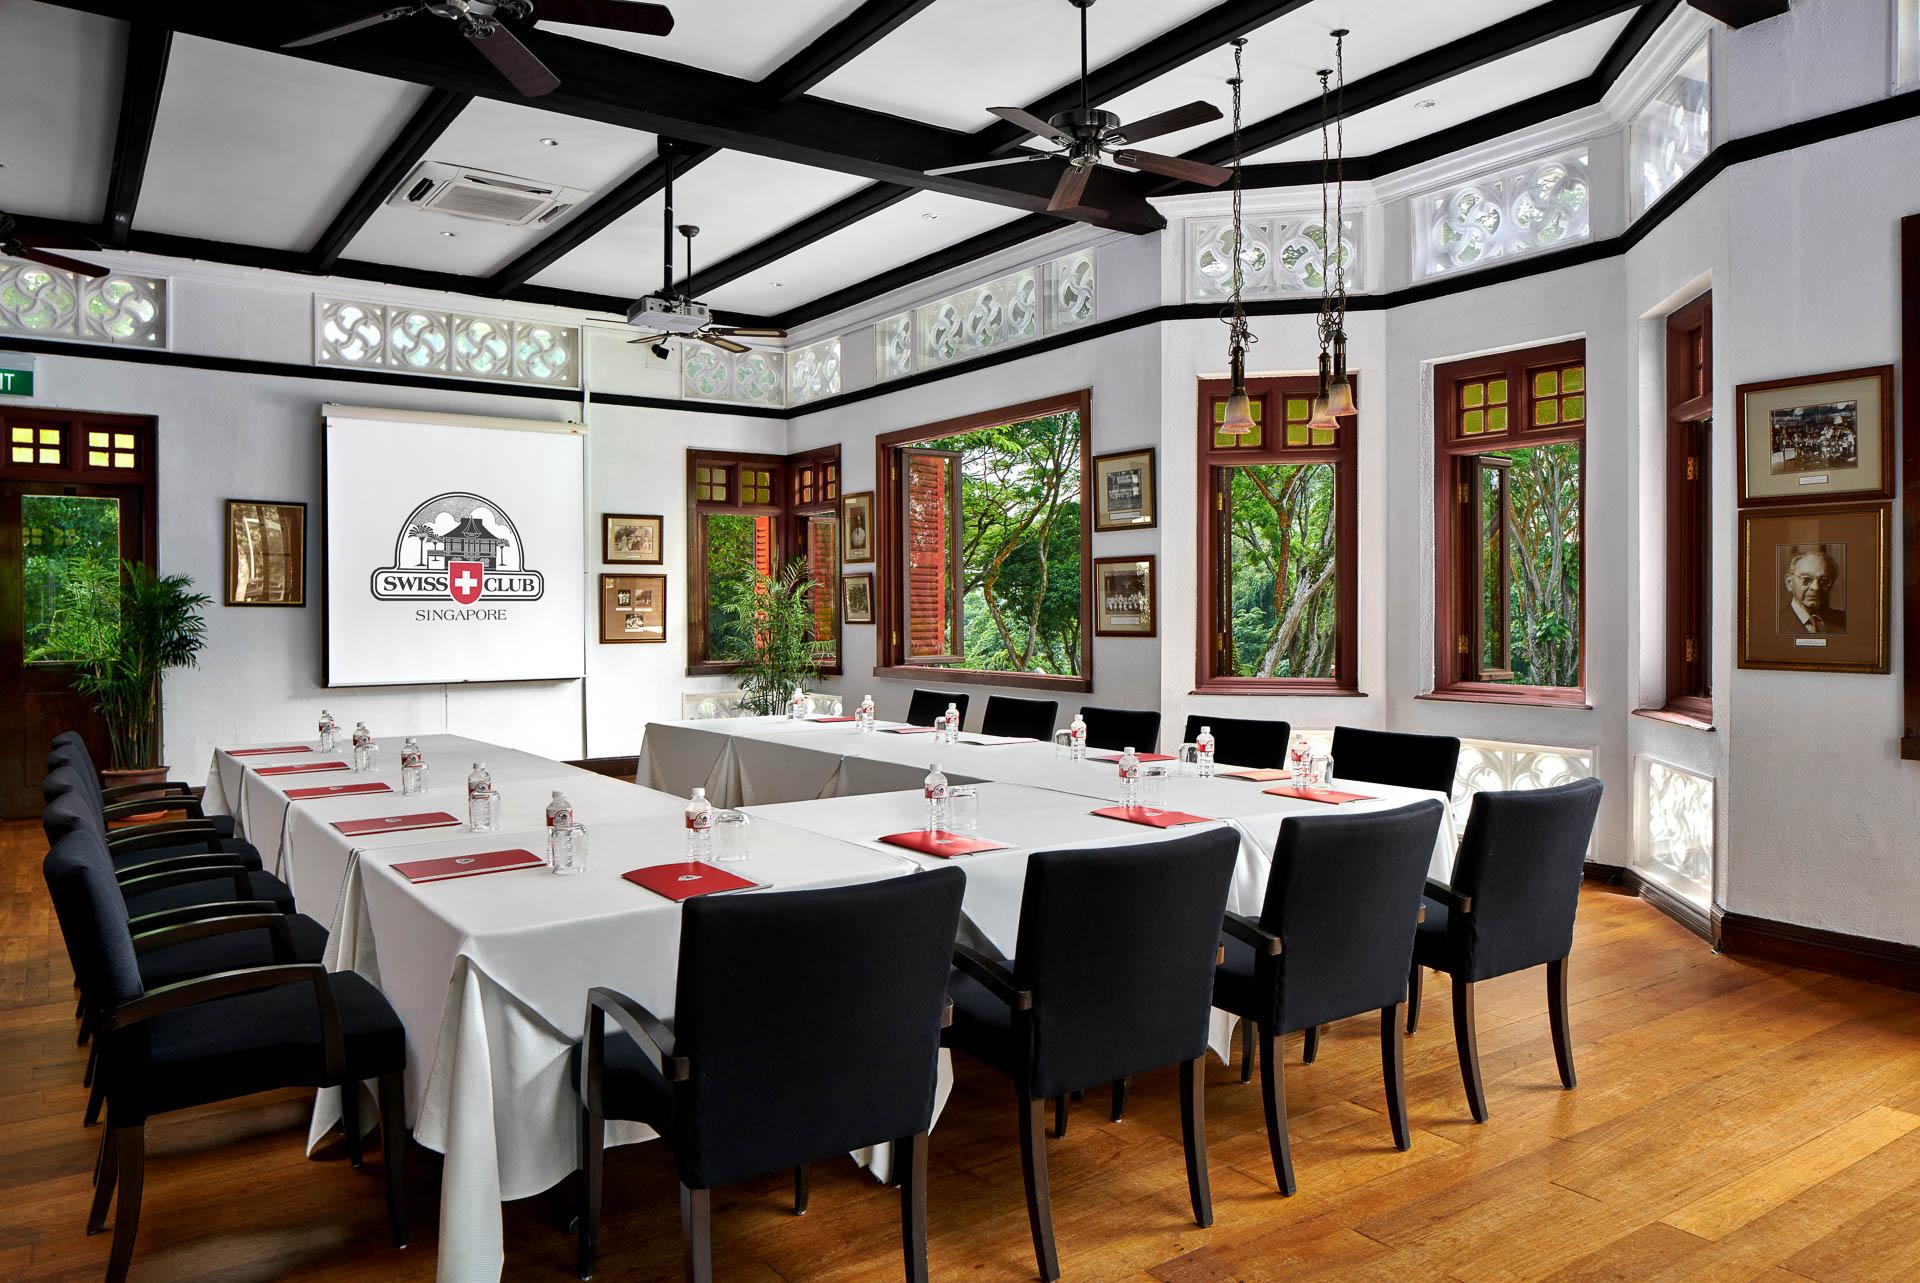 U Shape Meeting Room Setup at Swiss Club in Singapore